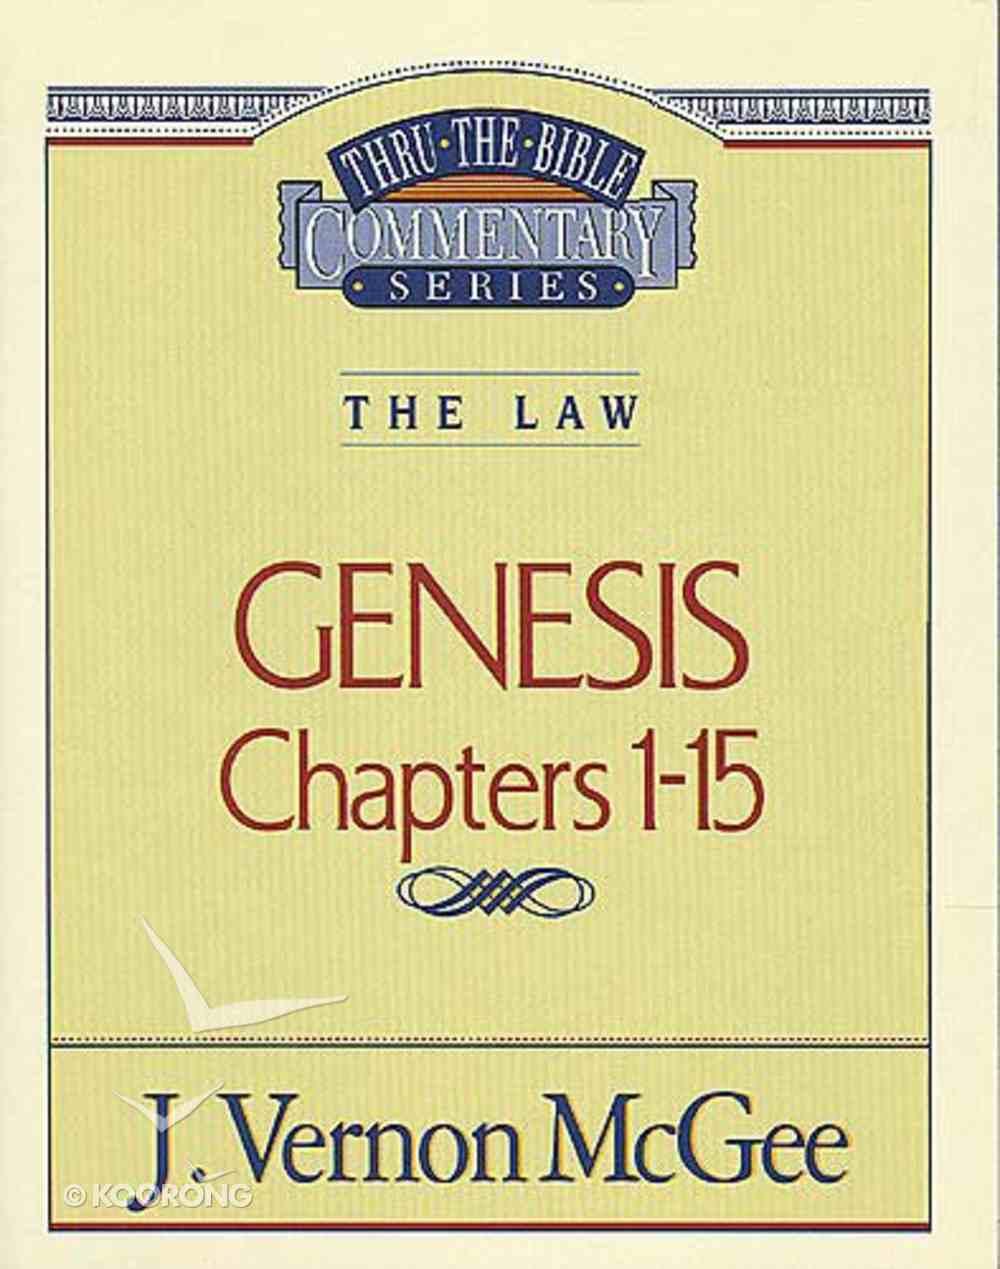 Thru the Bible OT #01: Genesis (Volume 1) (#01 in Thru The Bible Old Testament Series) Paperback